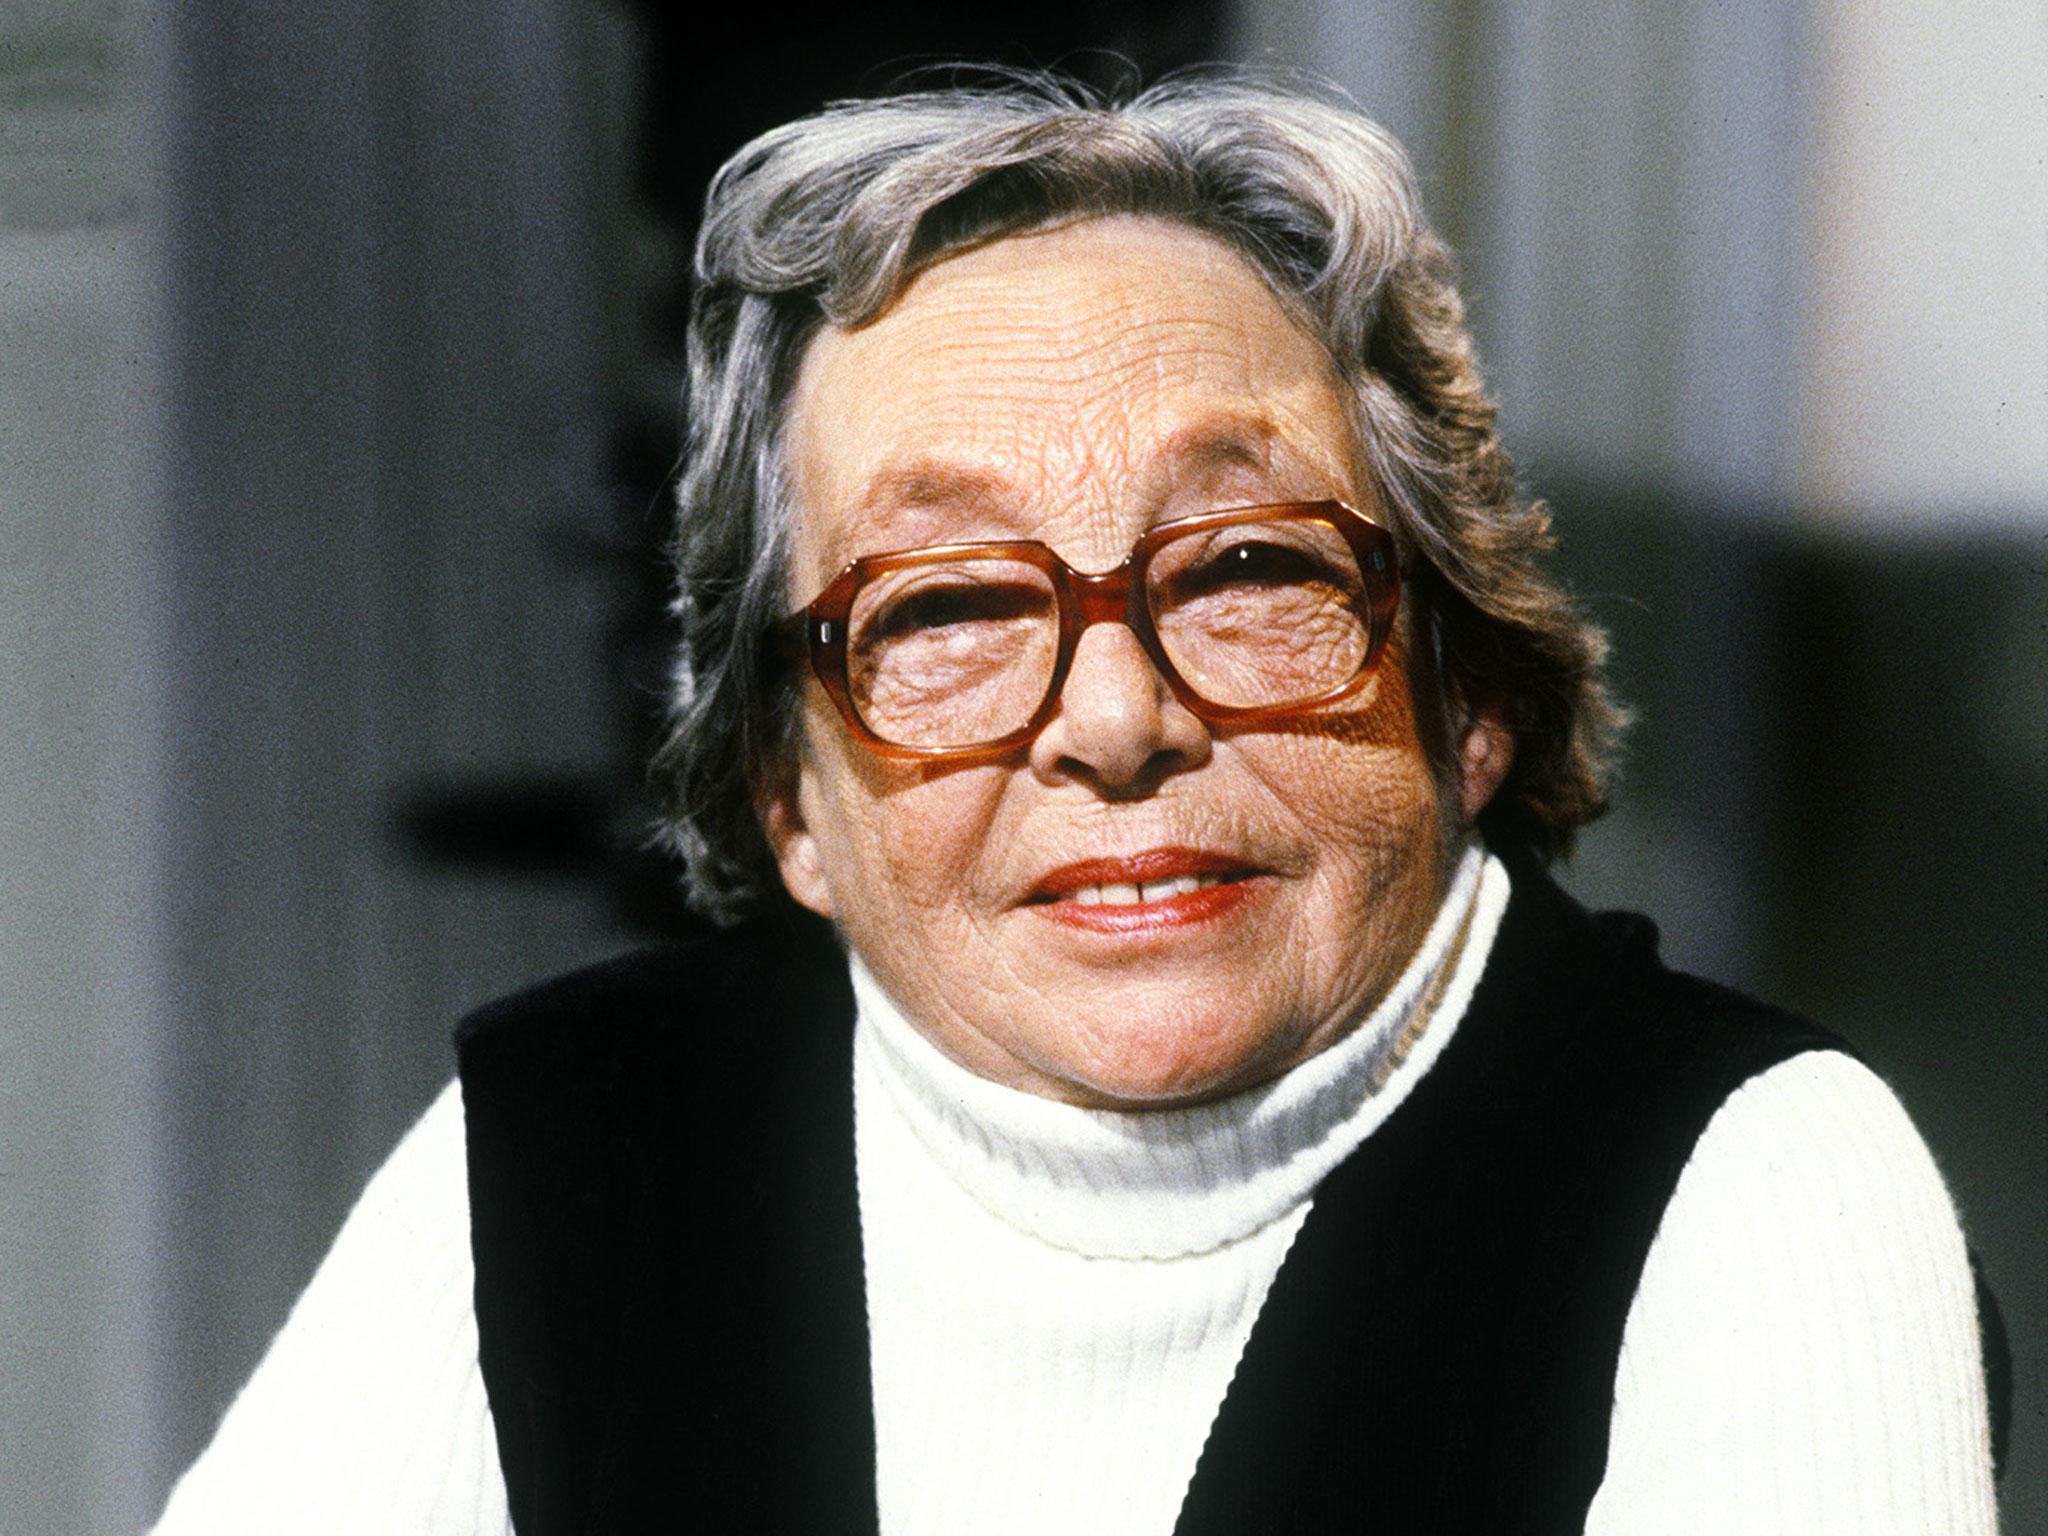 مارگریت دوراس ۱۹۹۶-۱۹۱۴